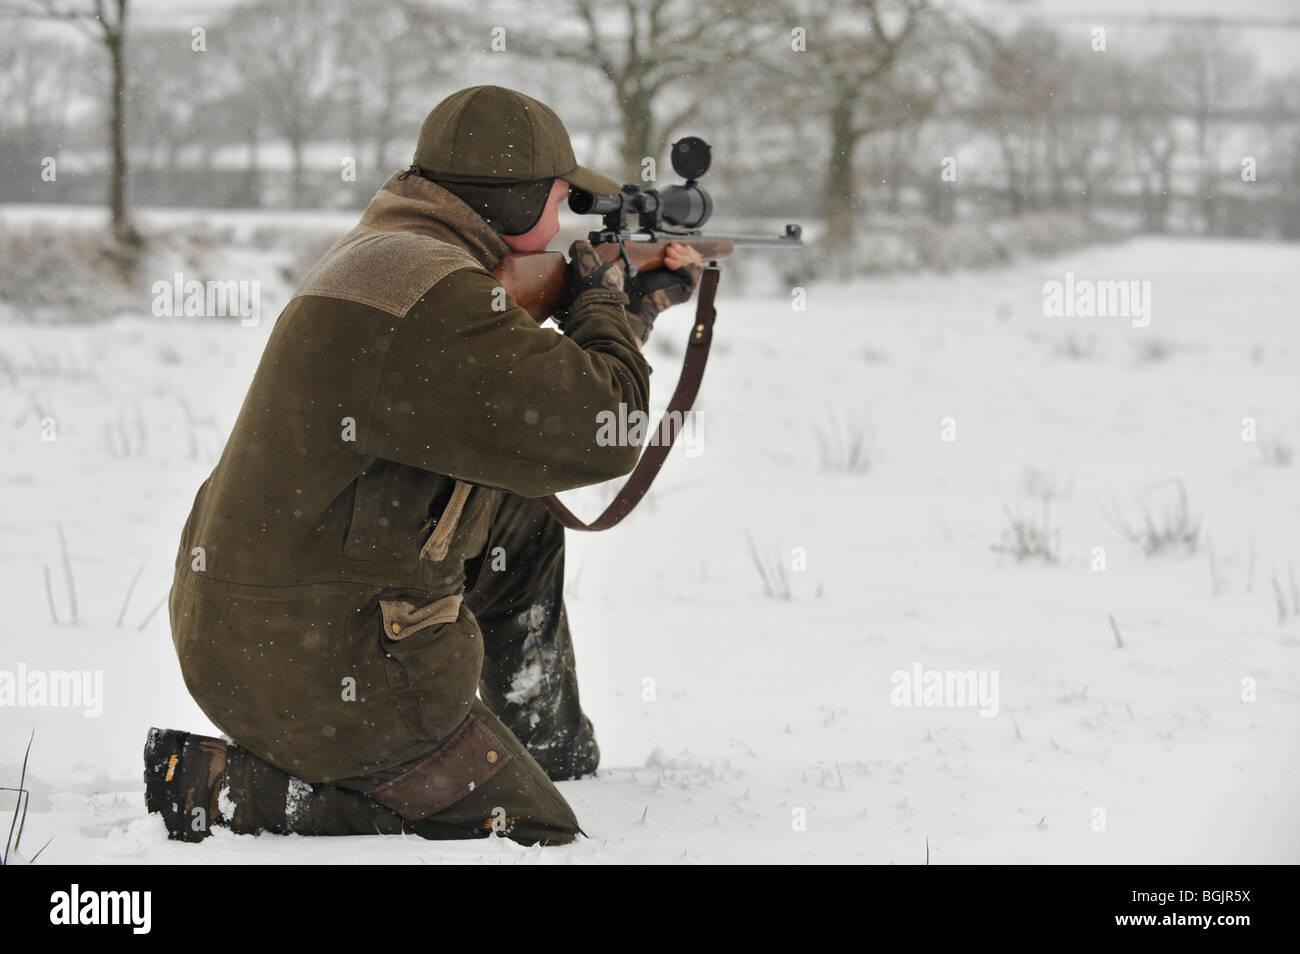 deer stalker taking aim - Stock Image